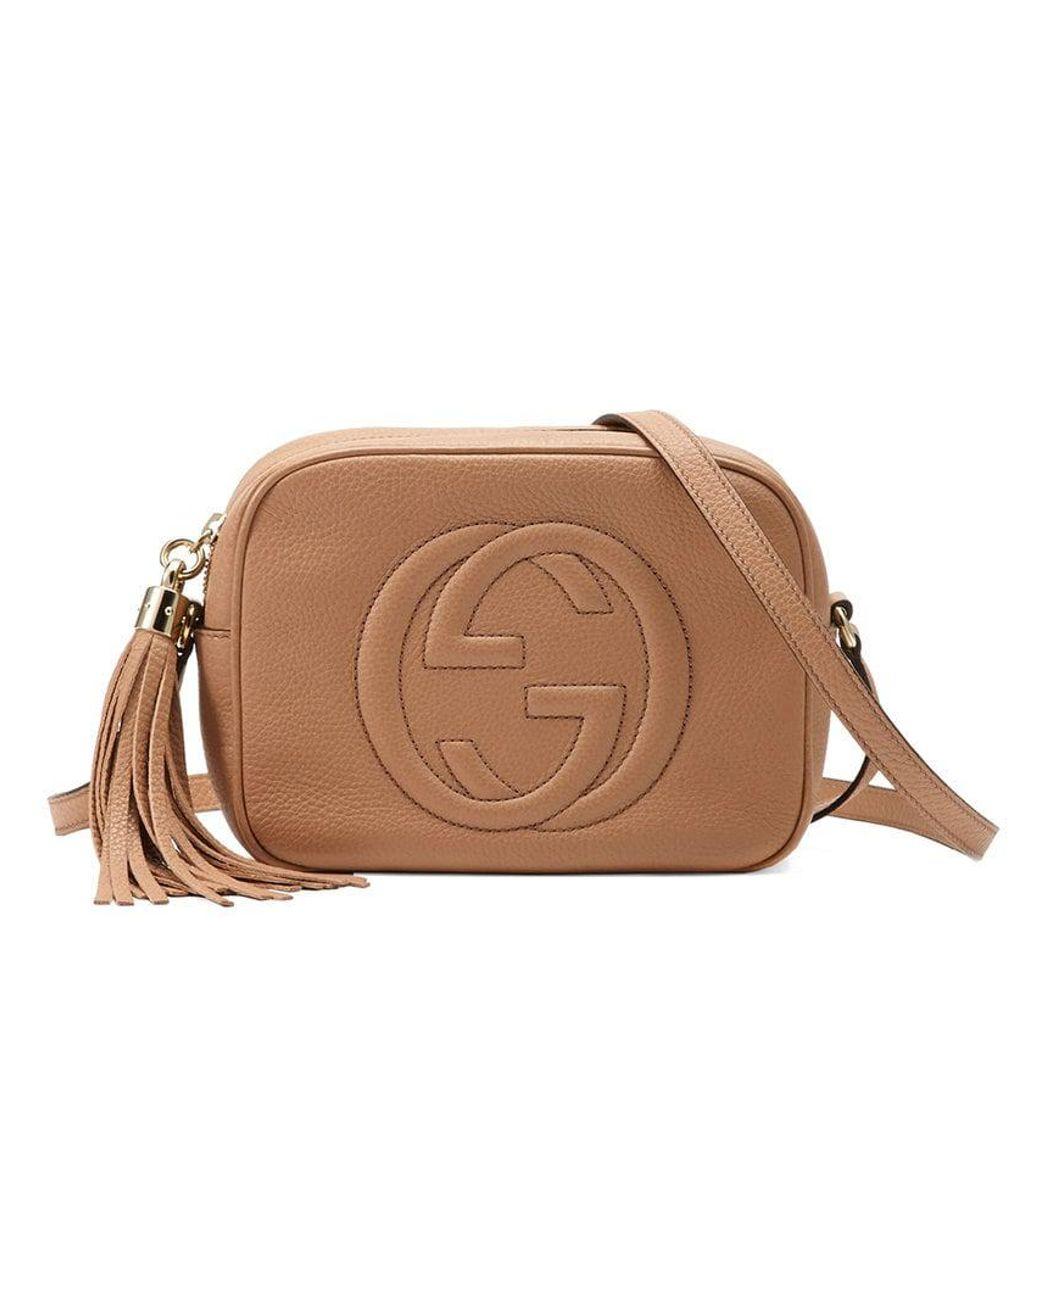 cf4039266dd1 Gucci Soho Small Leather Disco Bag - Save 4% - Lyst